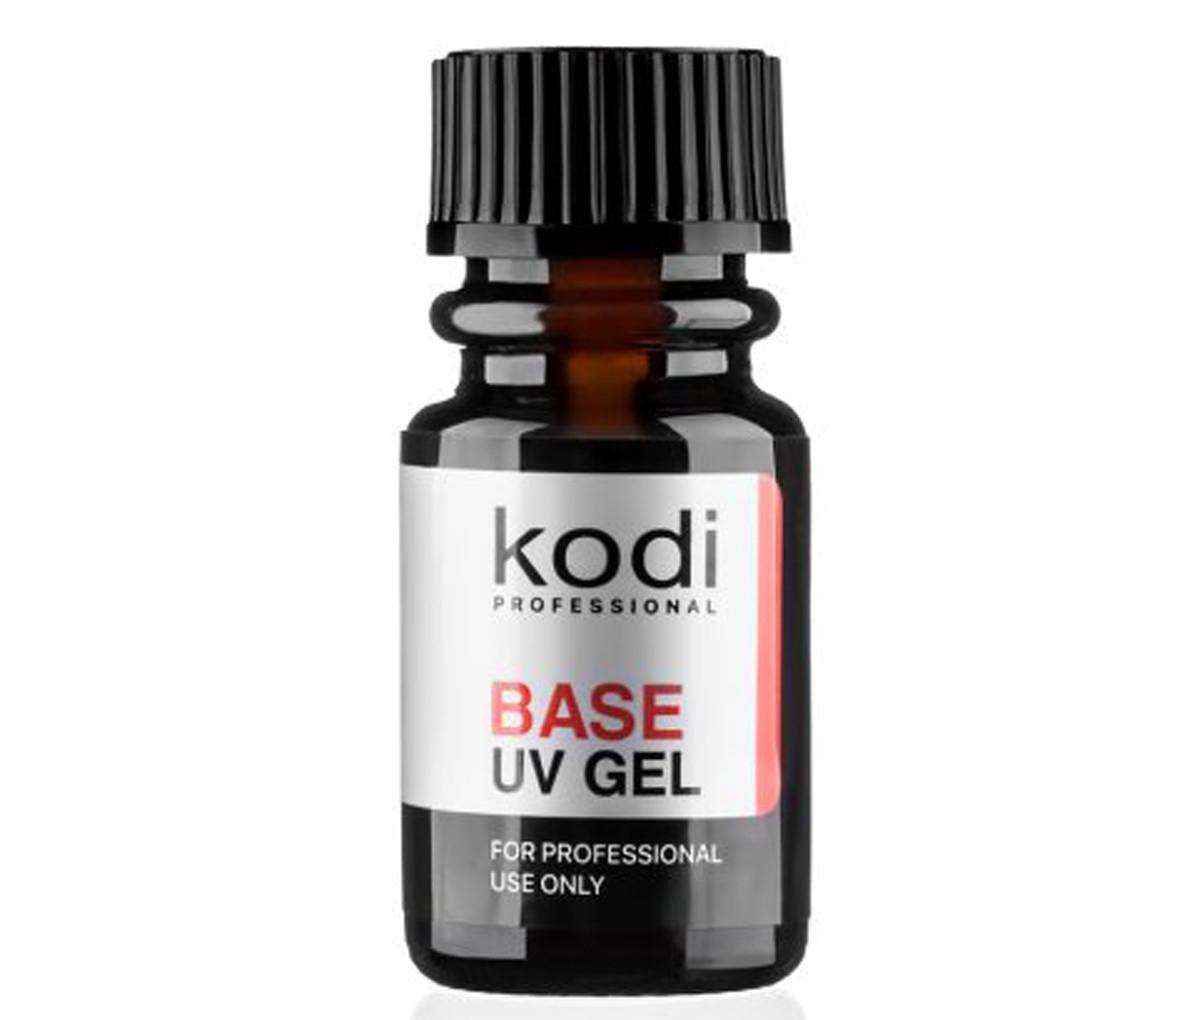 Kodi Base UV Gel 10 ml Базовое покрытие для геля